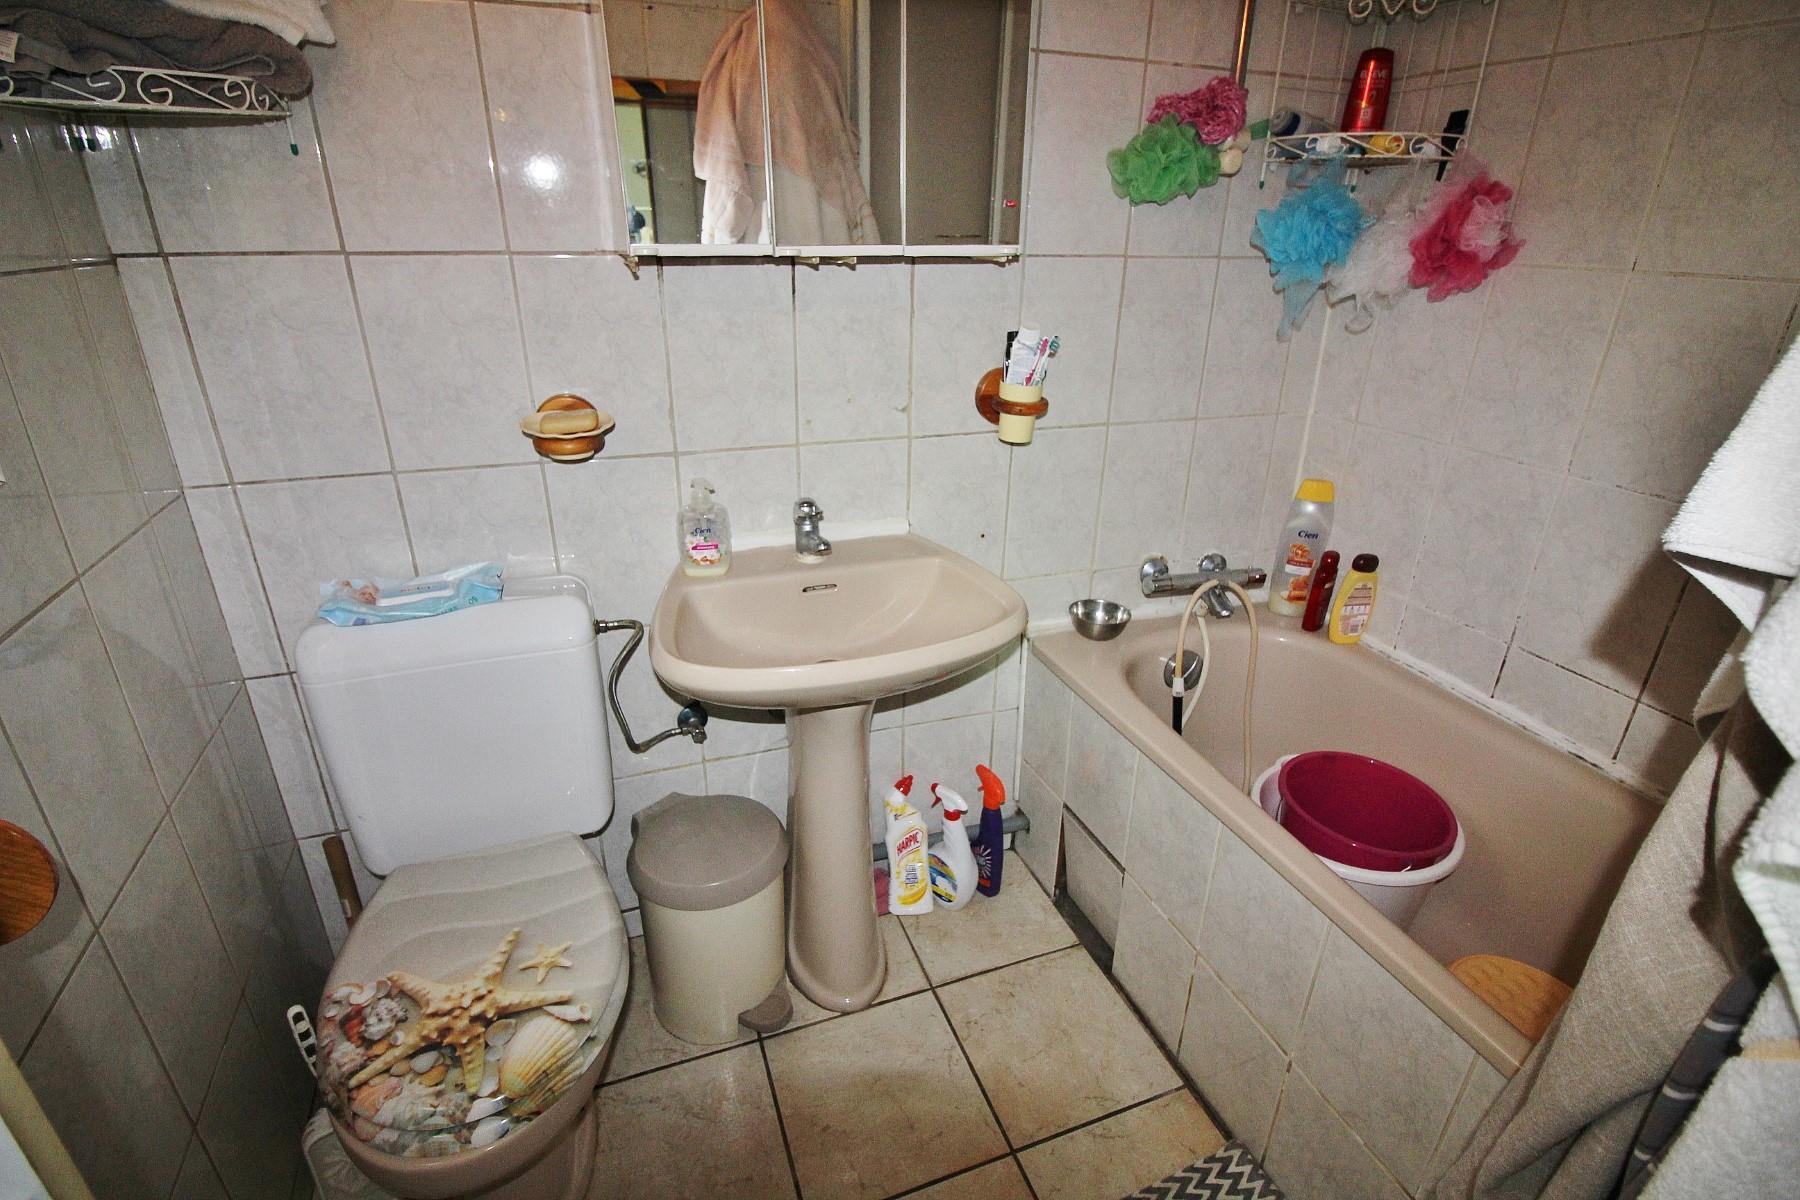 Maison - Seraing Jemeppesur-Meuse - #3879549-7